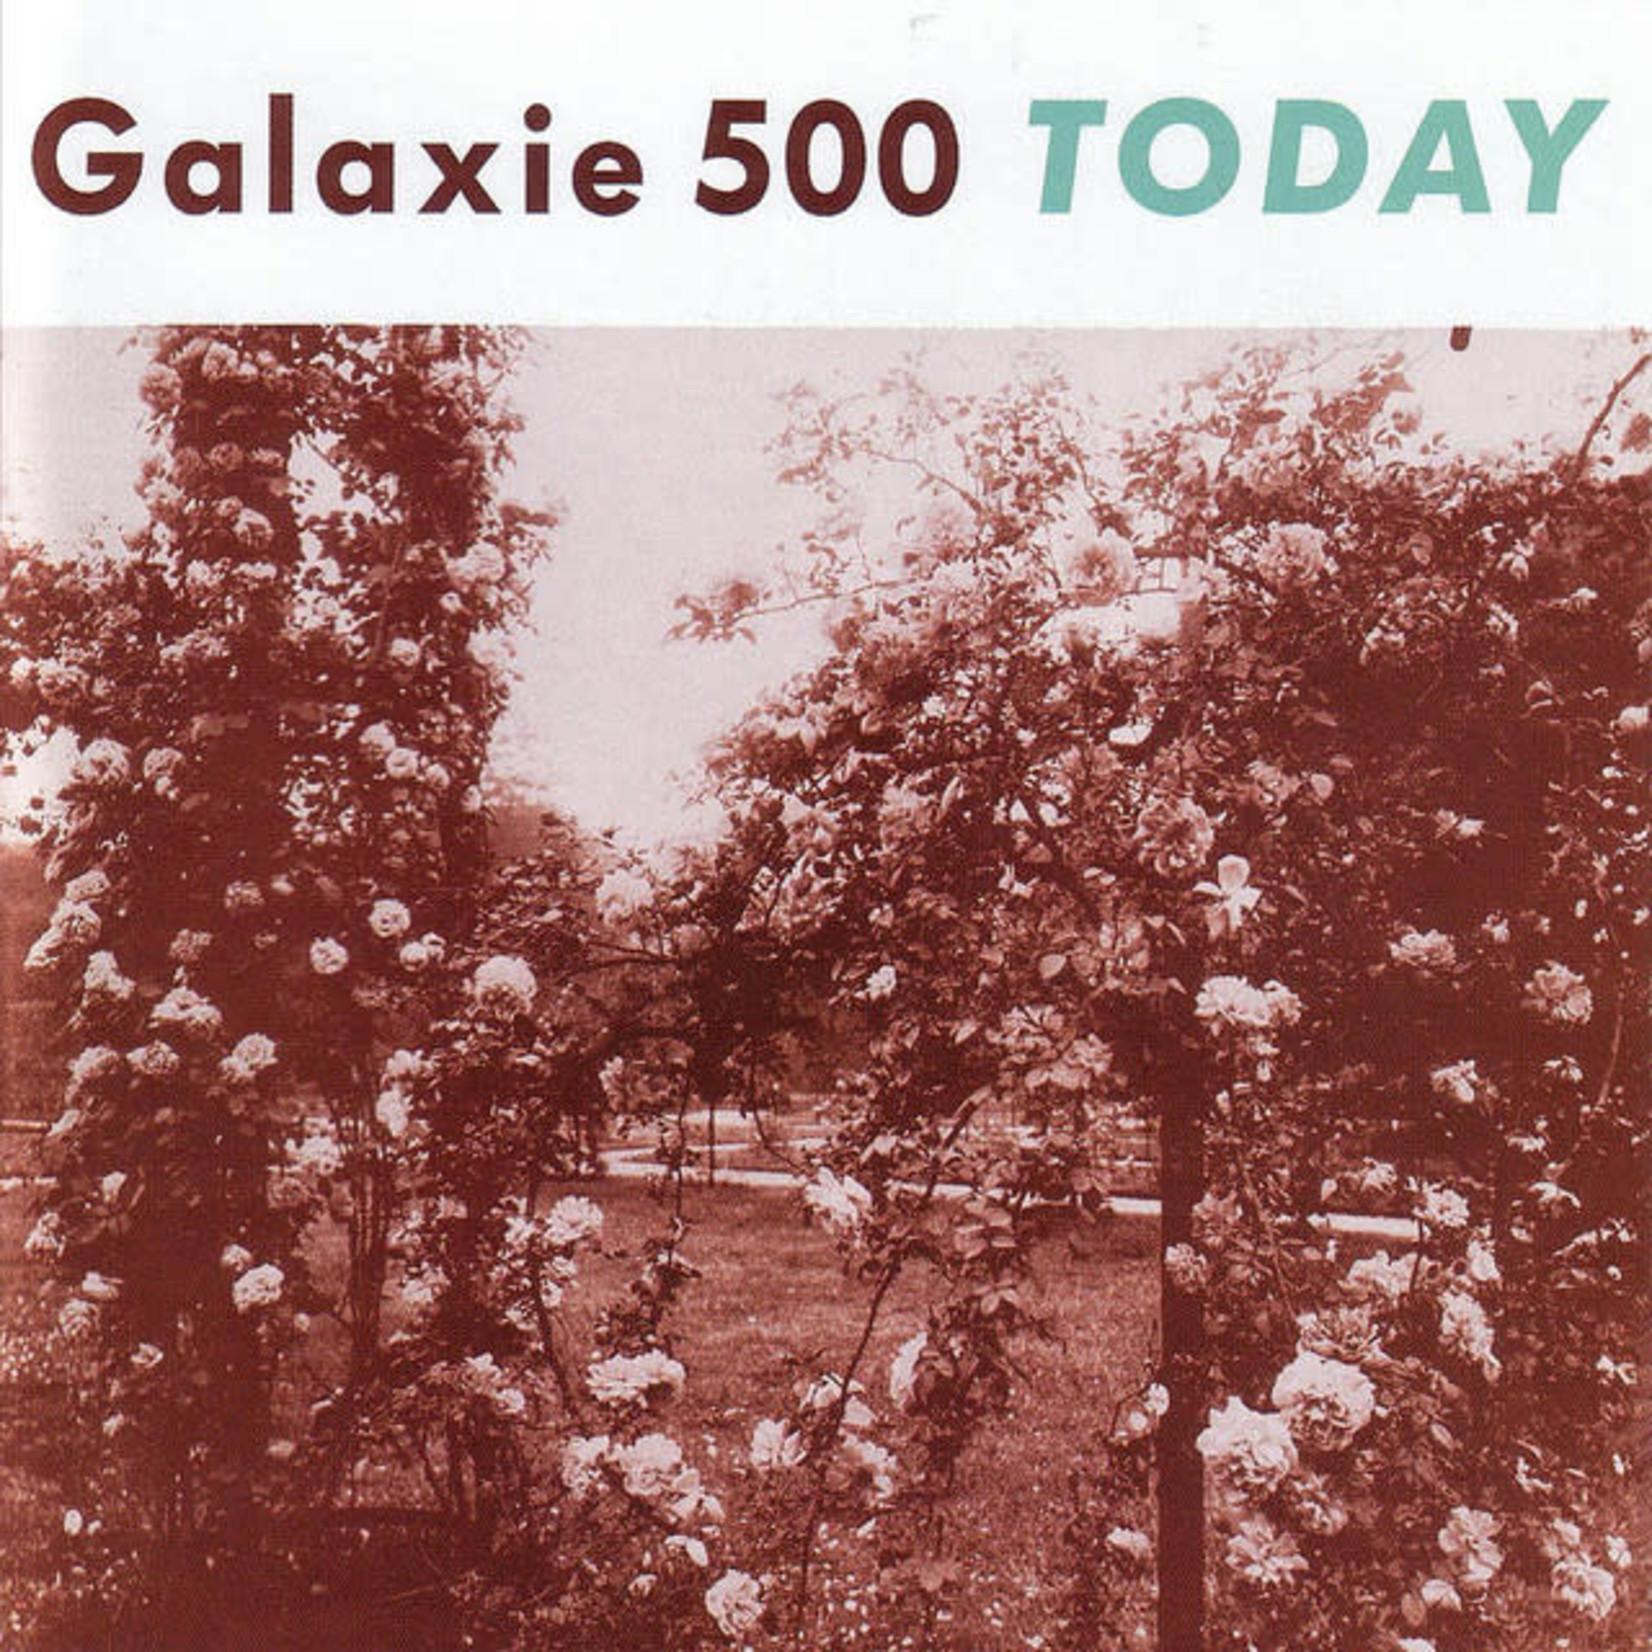 Vinyl Galaxie 500 - Today